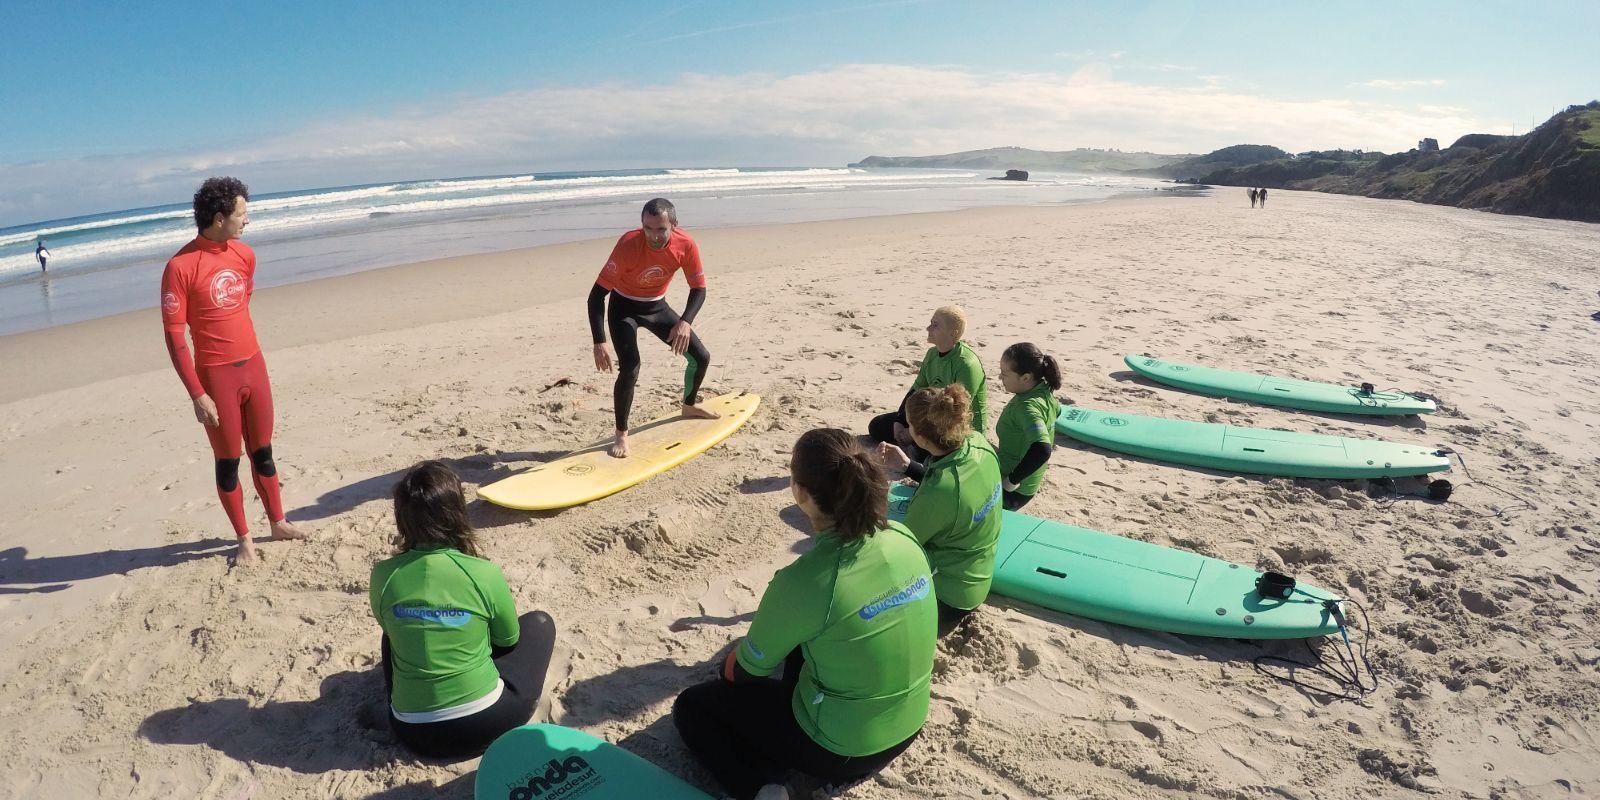 Profesores de surf con alumnos en arena